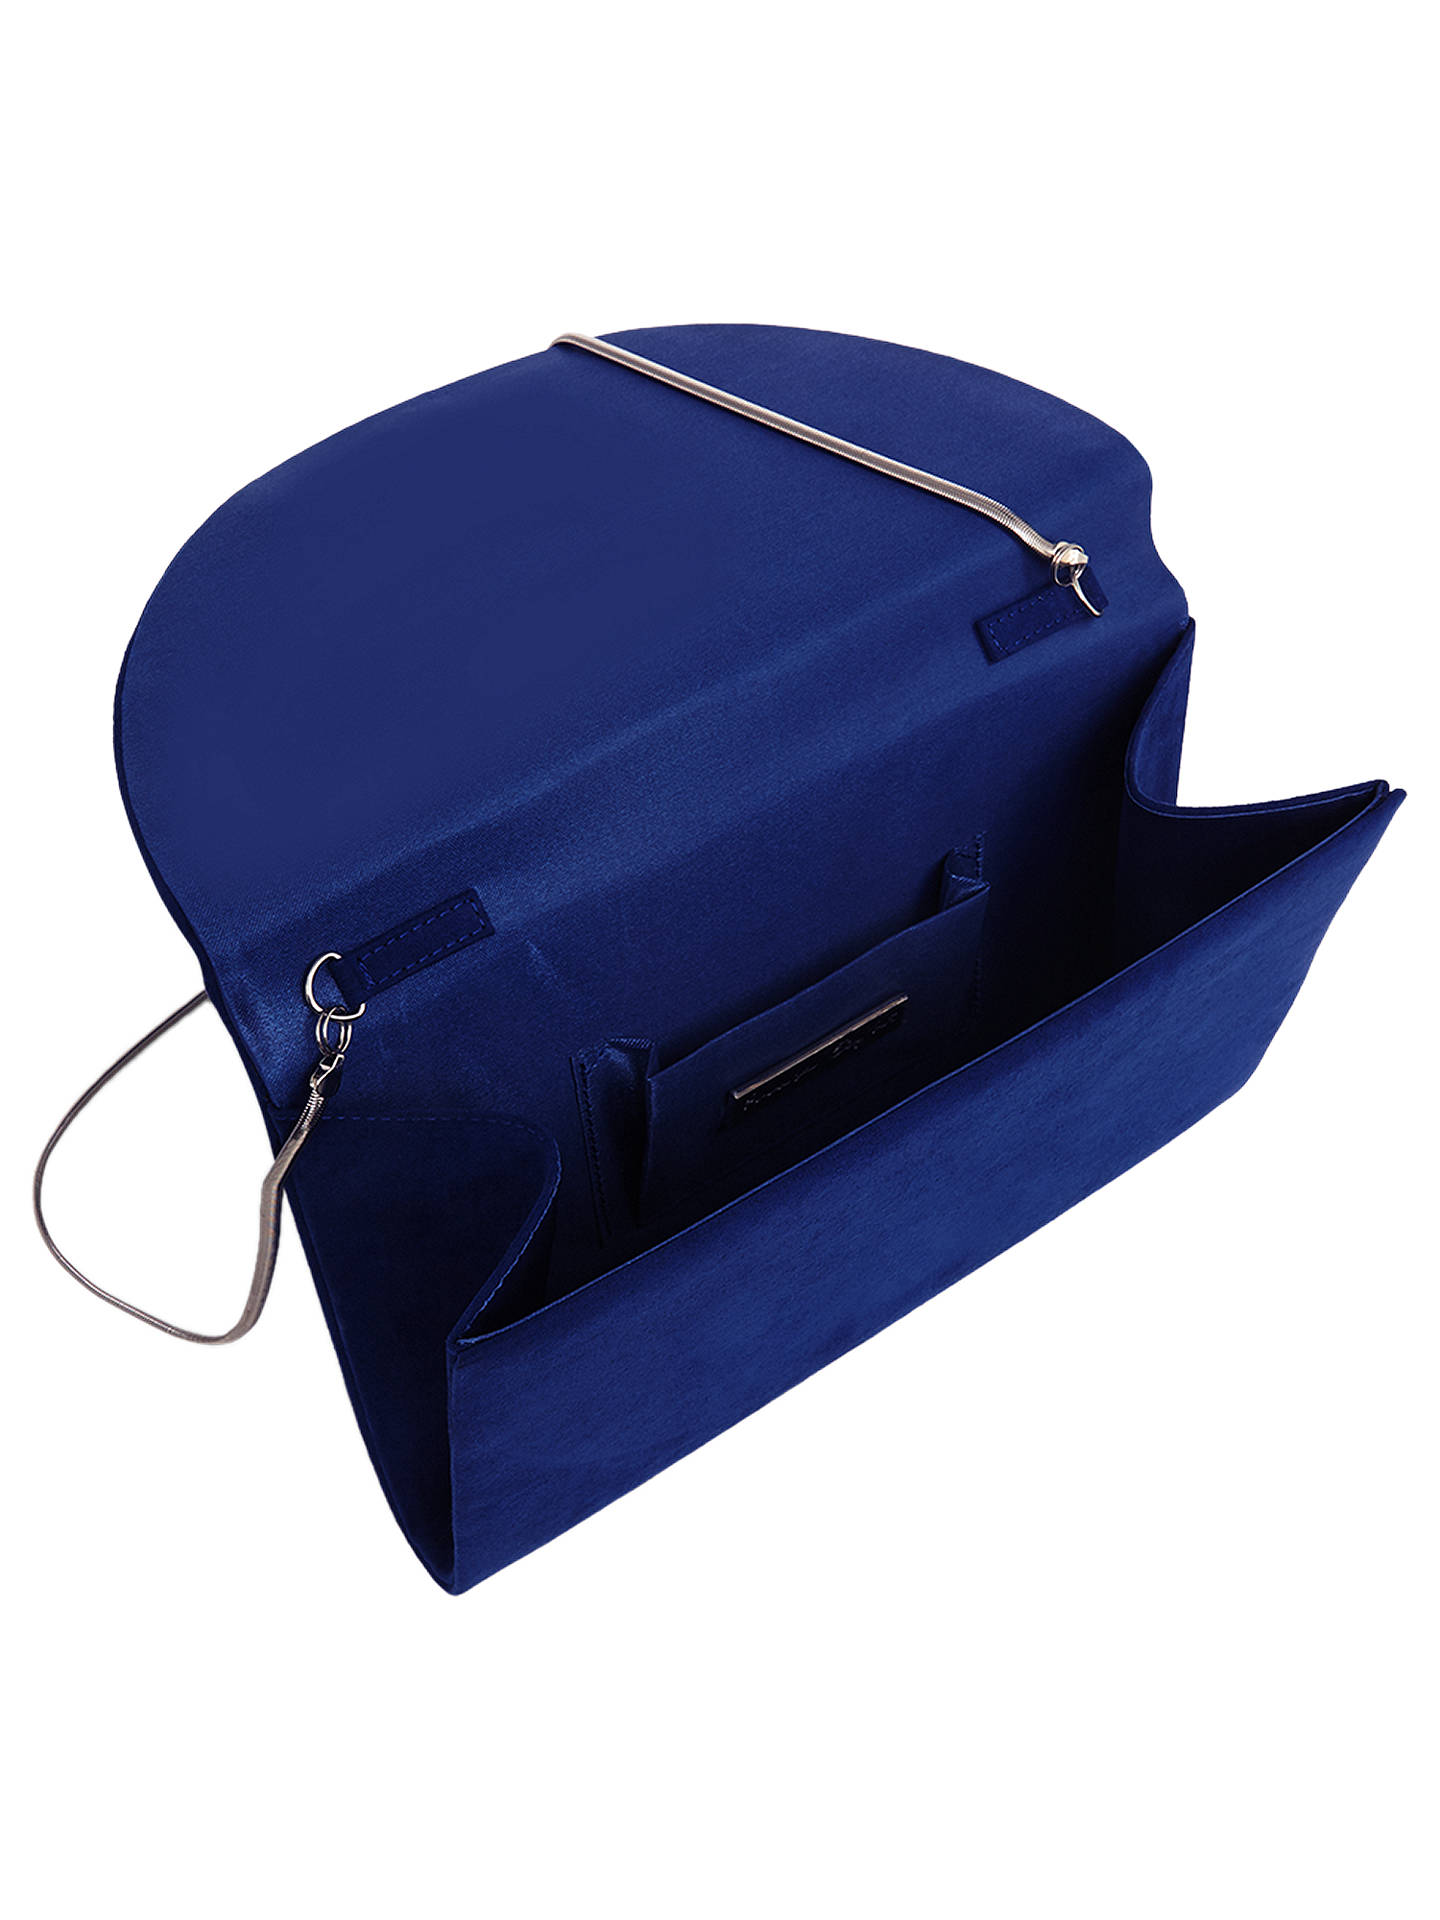 4144c329c243 ... Buy Phase Eight Eleonor Jewel Trim Clutch Bag